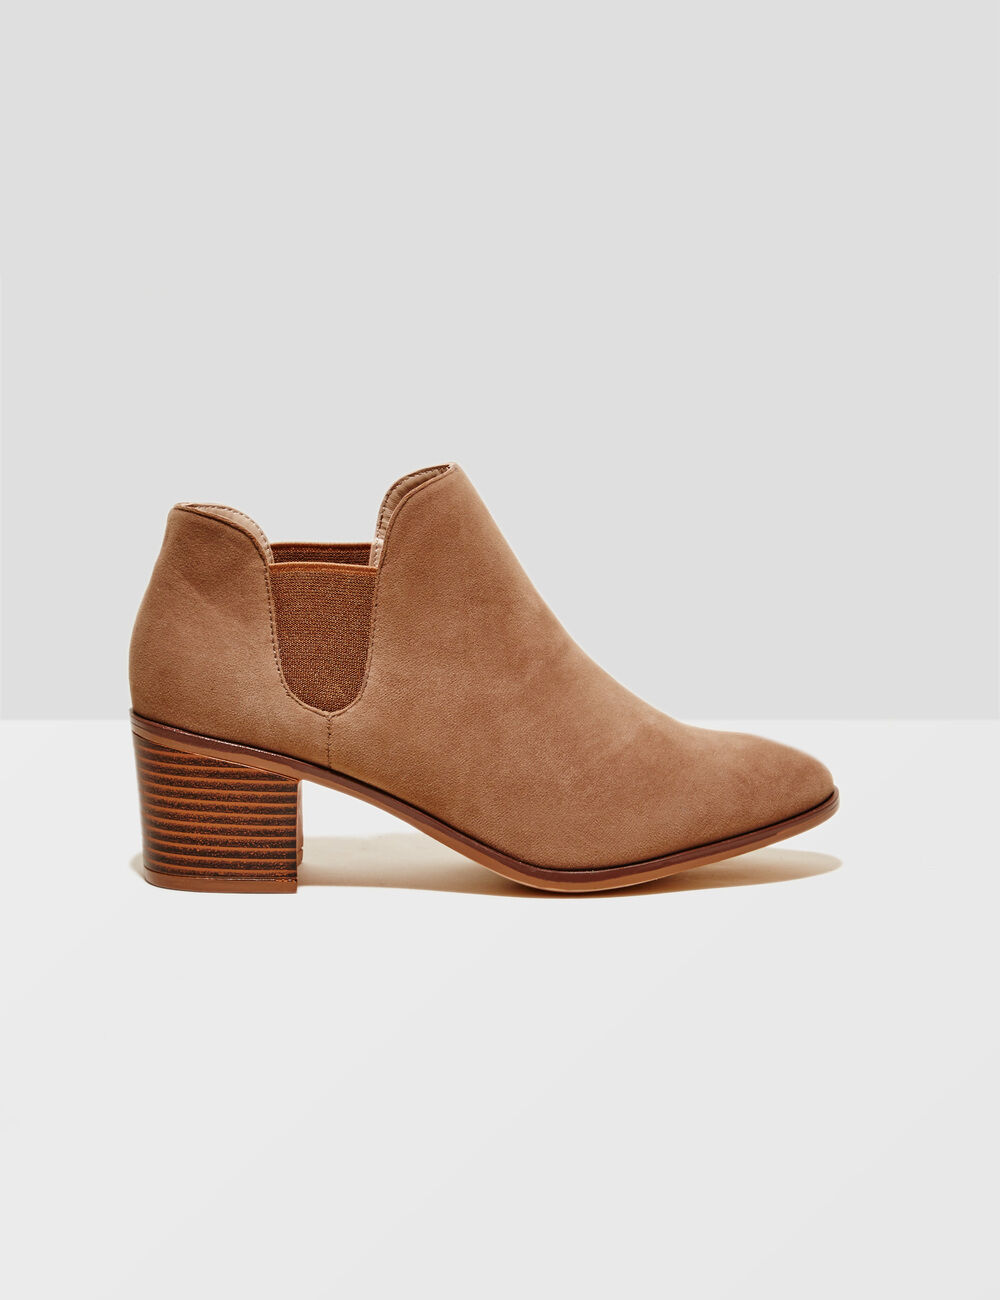 Camel faux suede boots ...